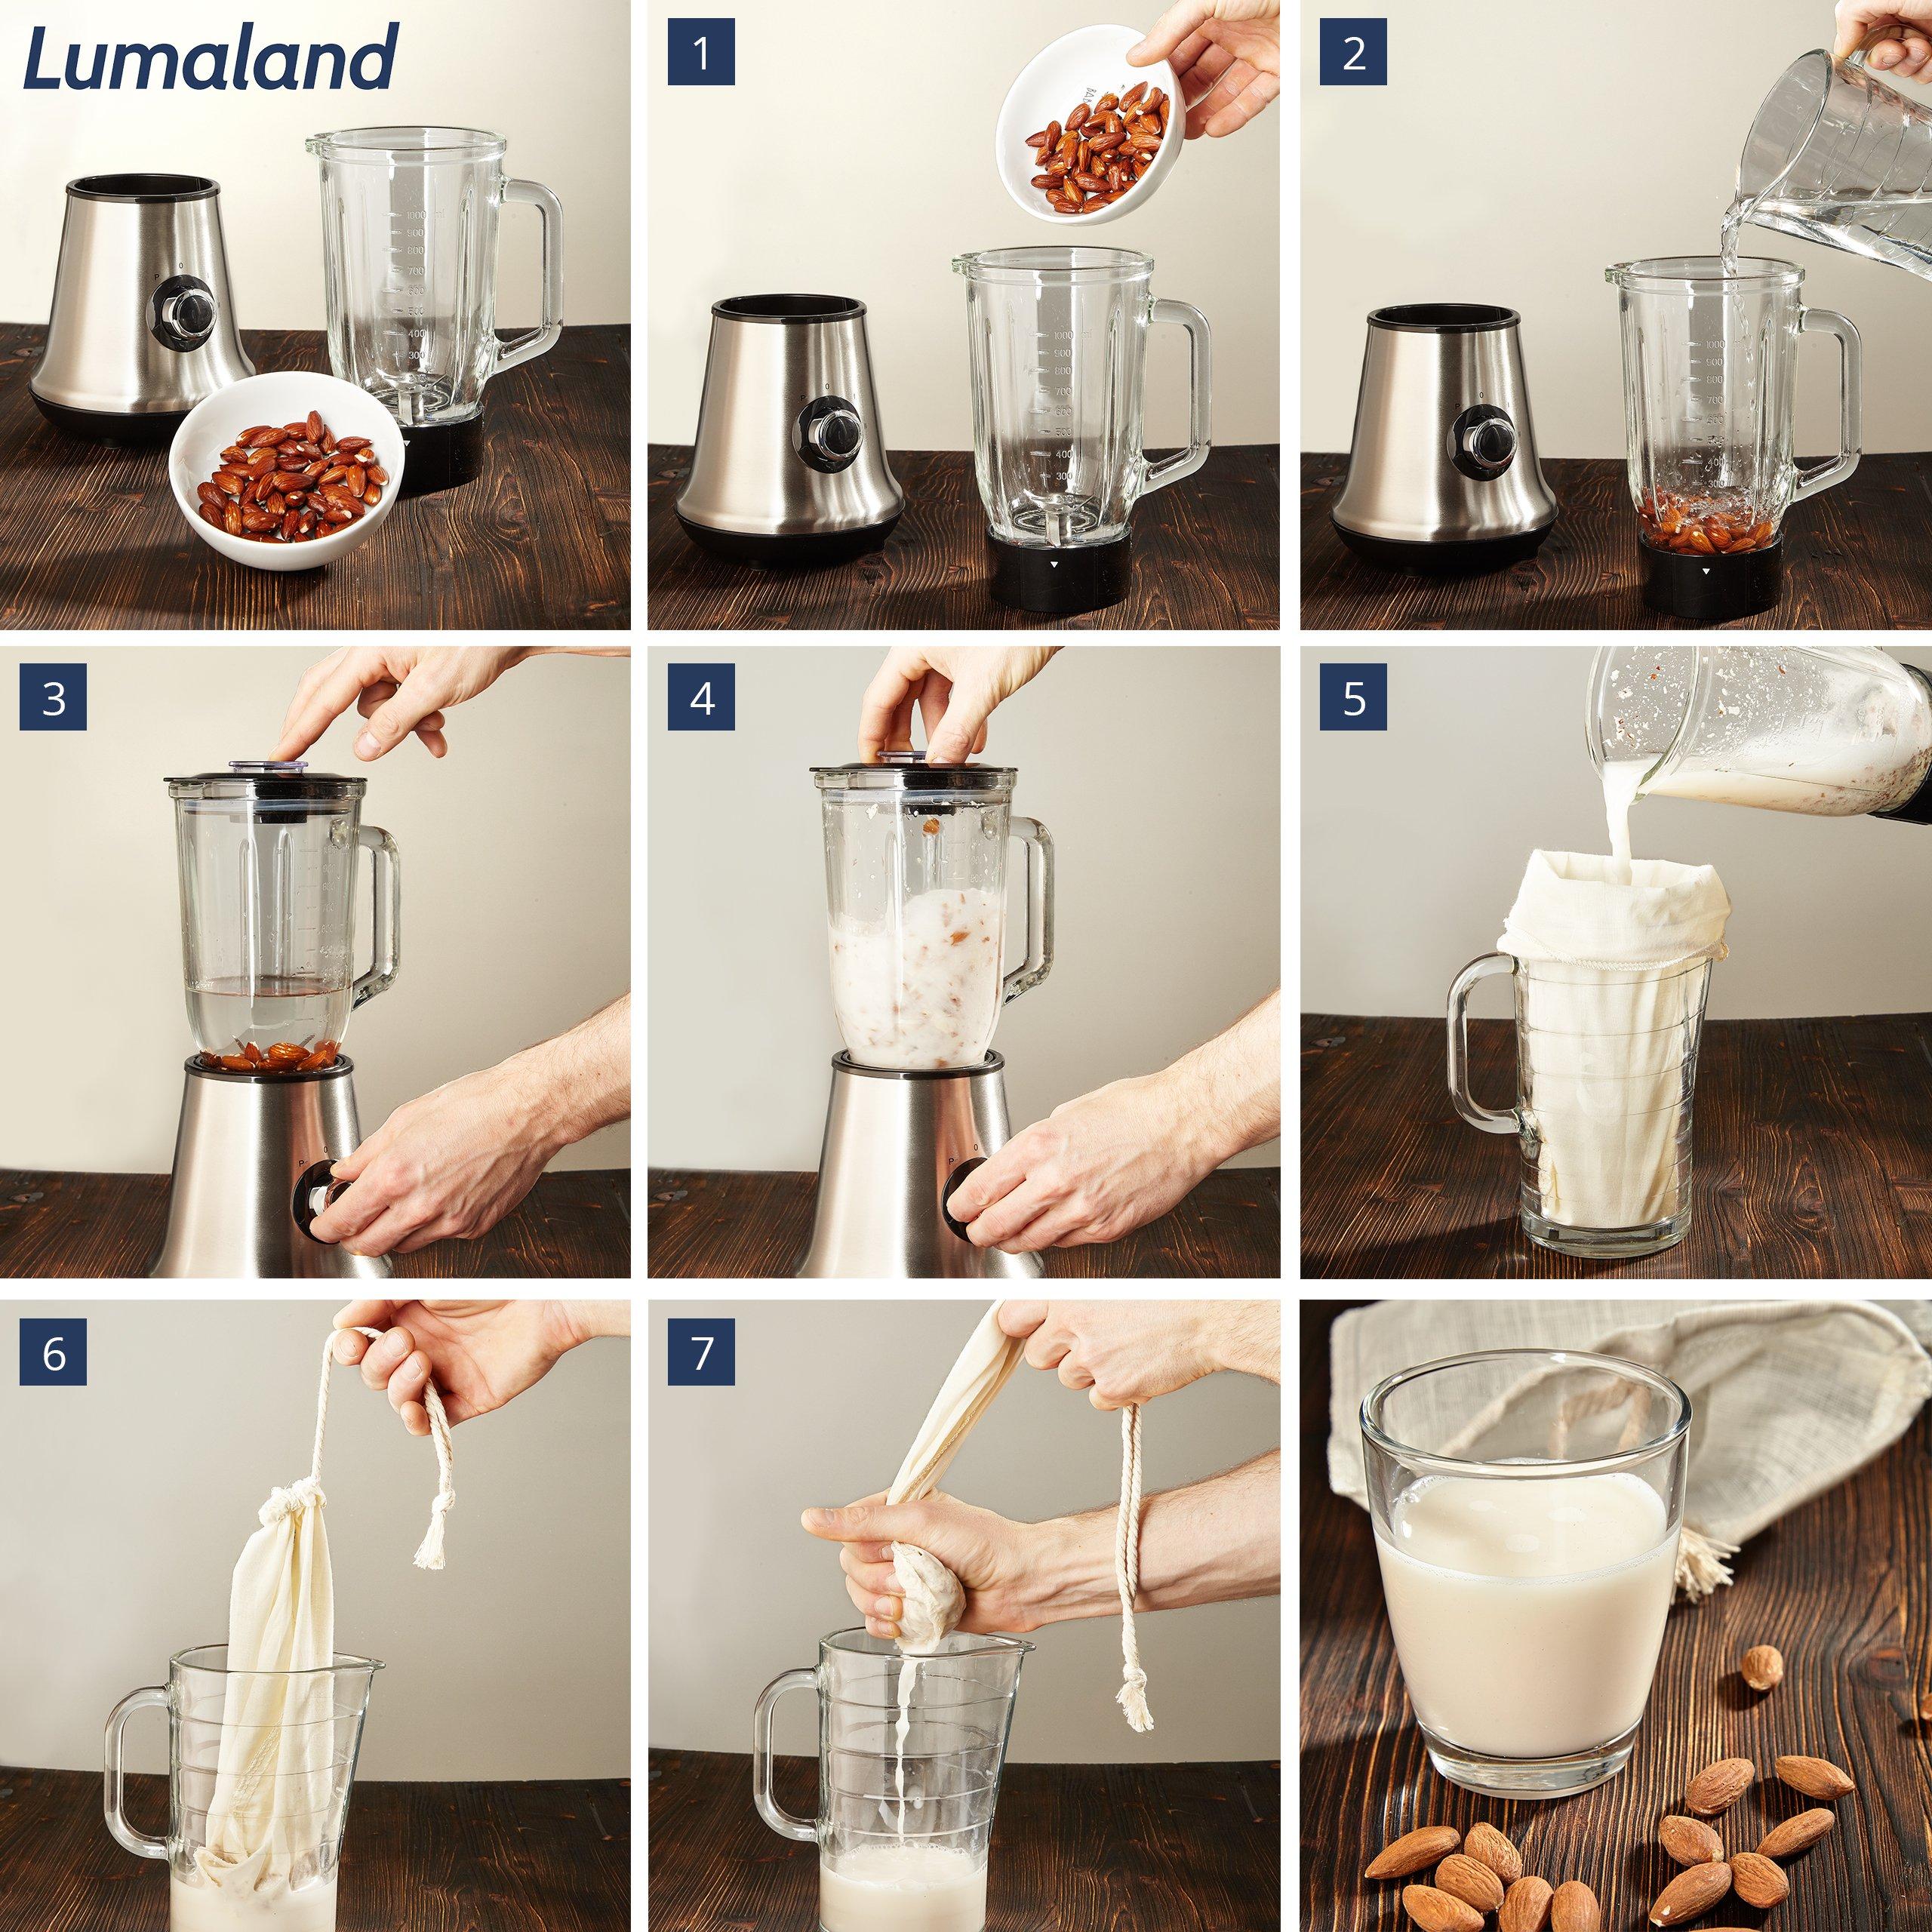 Compra Lumaland Cuisine bolsa filtro leche vegetal.Tejido natural ...